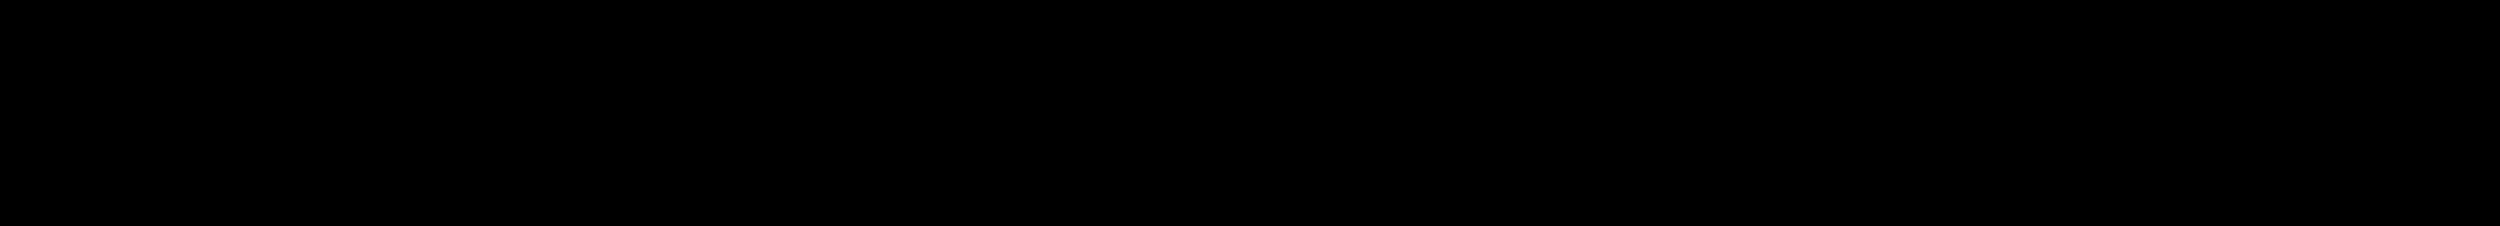 Logo_ARCAHORN_-_nero_trasp.png